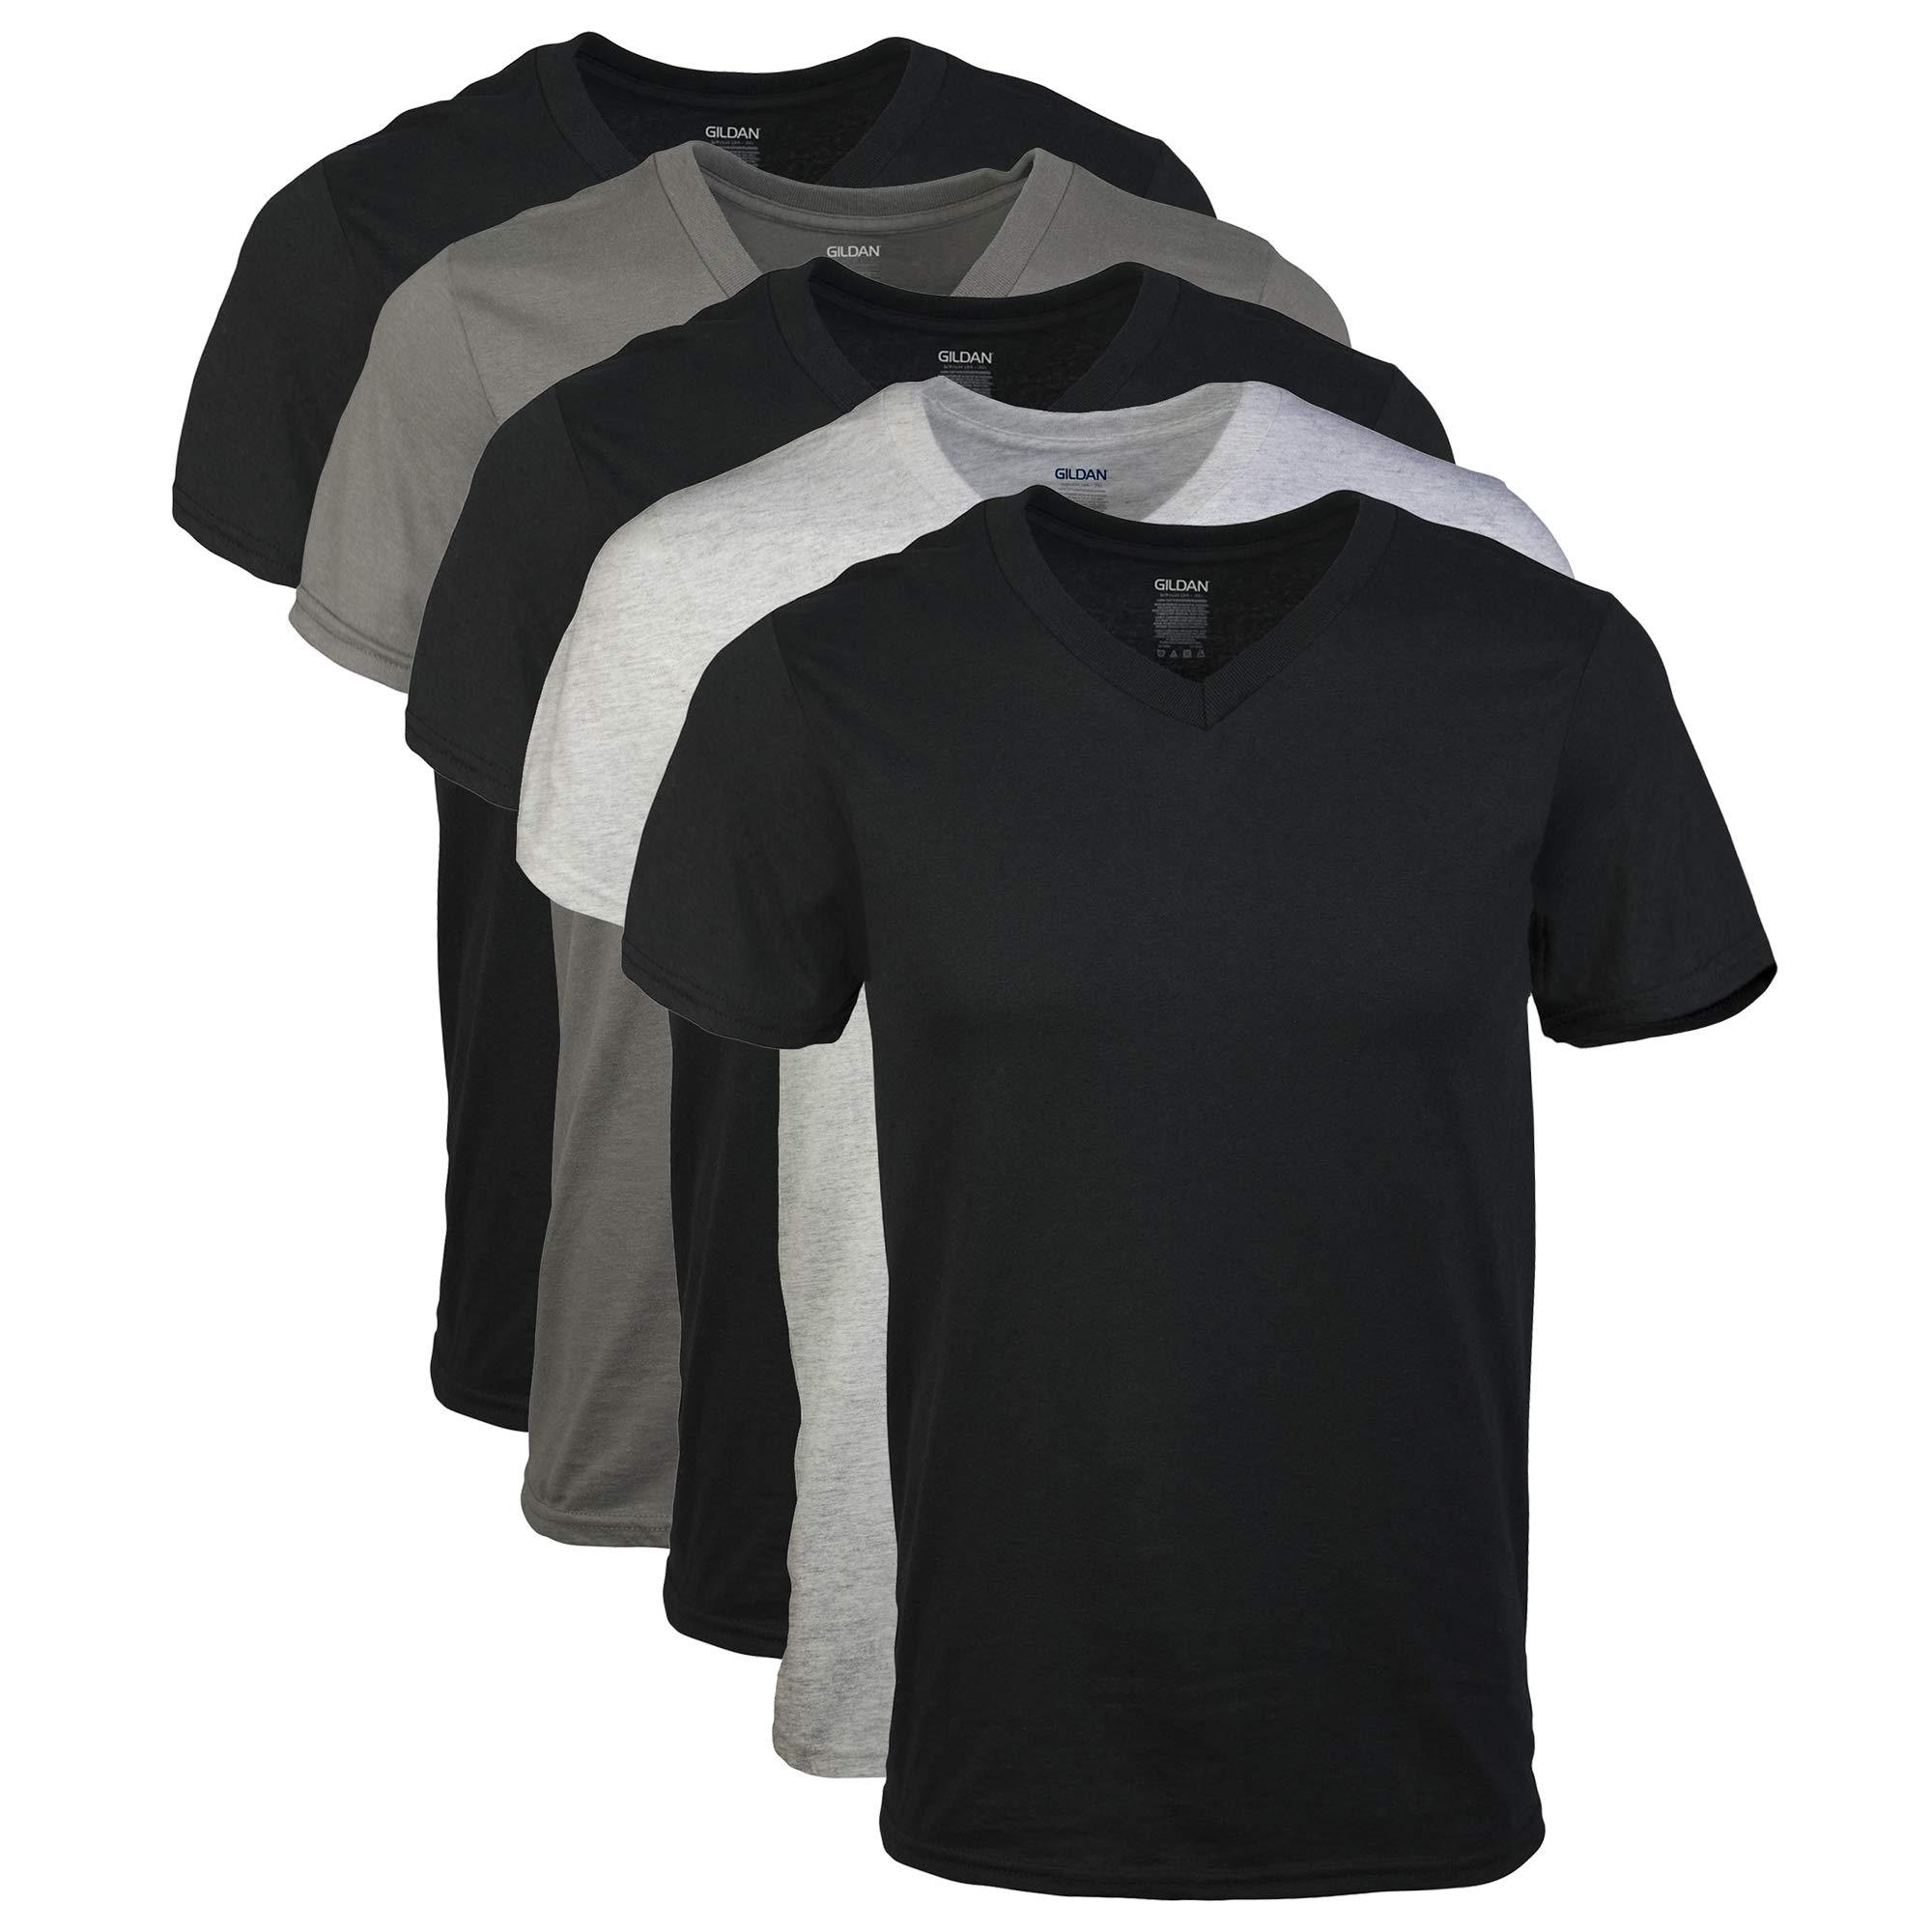 Gildan Men's V-Neck T-Shirts Multipack, Assorted 2XL (5 Pack), 2X-Large by Gildan